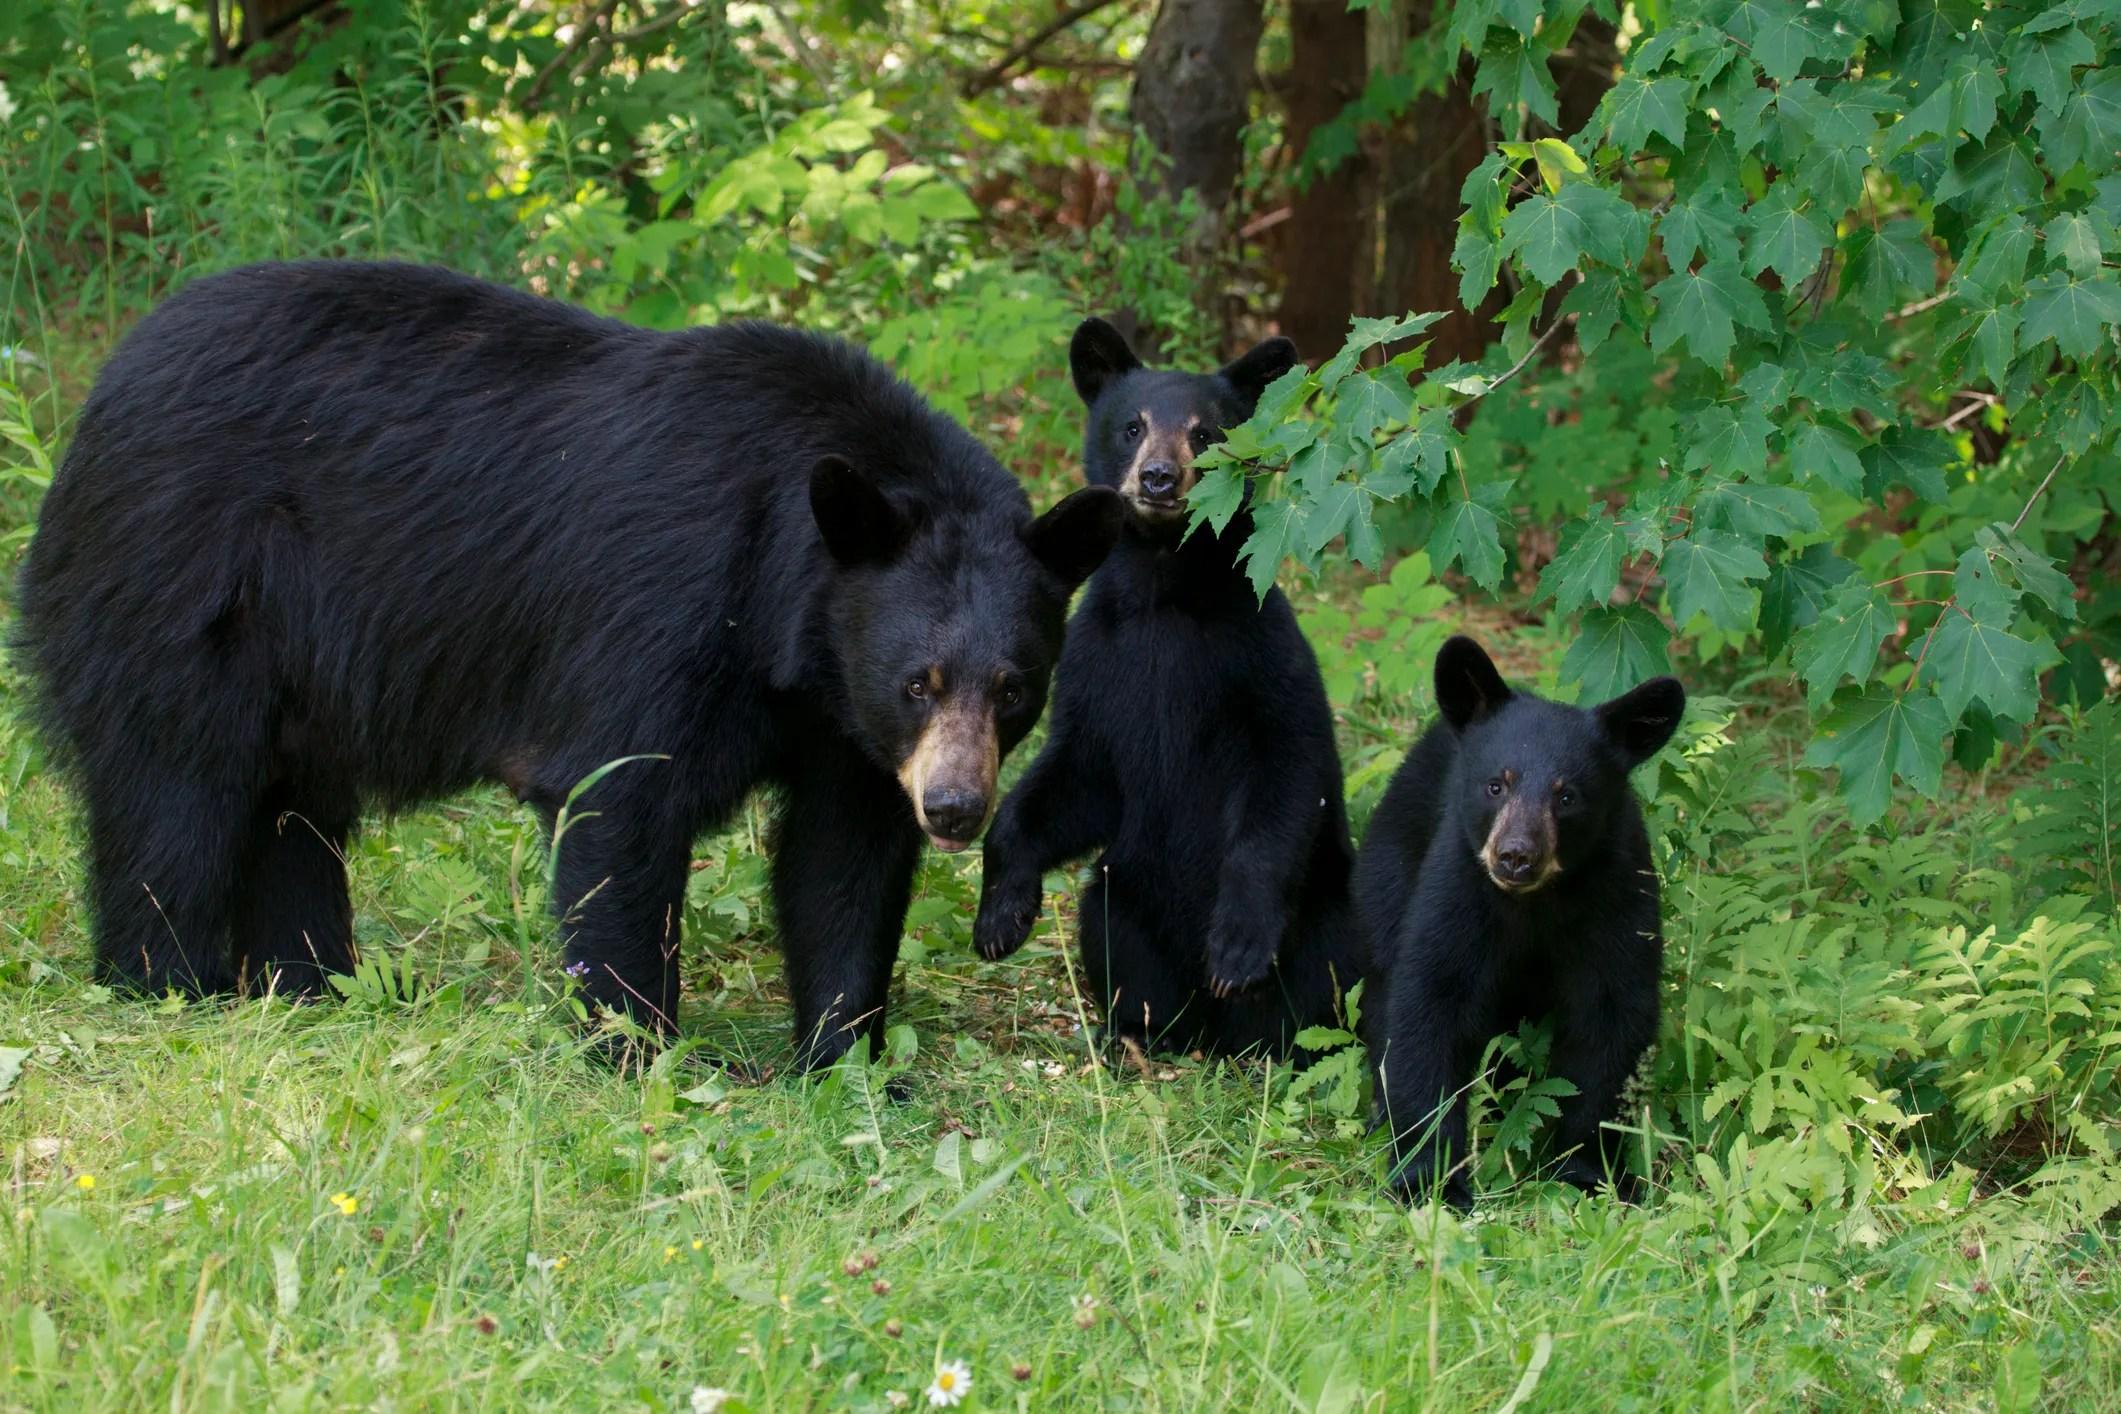 Poachers shot 'shrieking' newborn bear cubs and their mother as game camera recorded